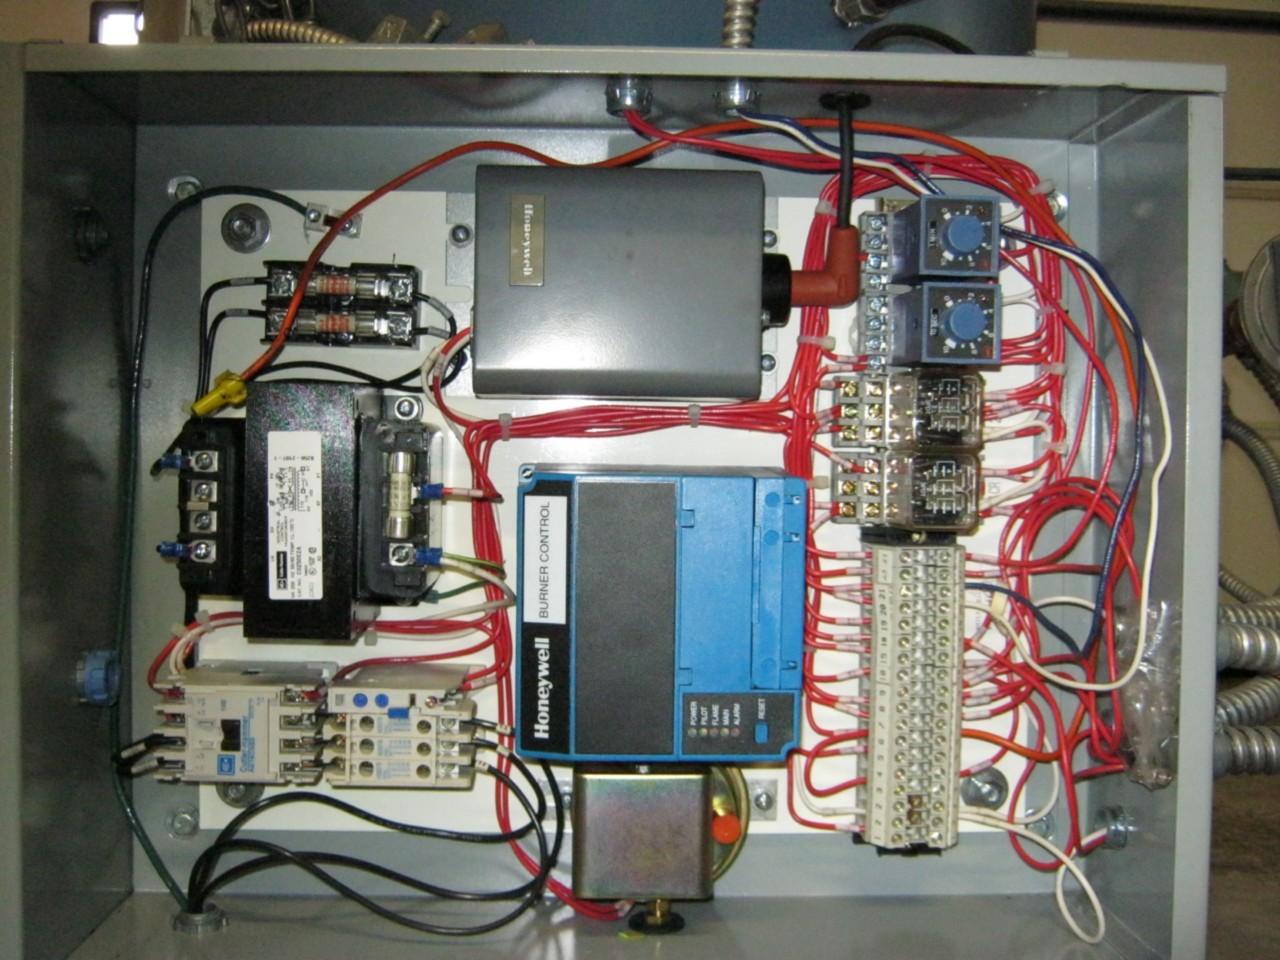 Hartzell 930 000 Btu Air Blast Heat Recovery Furnace W